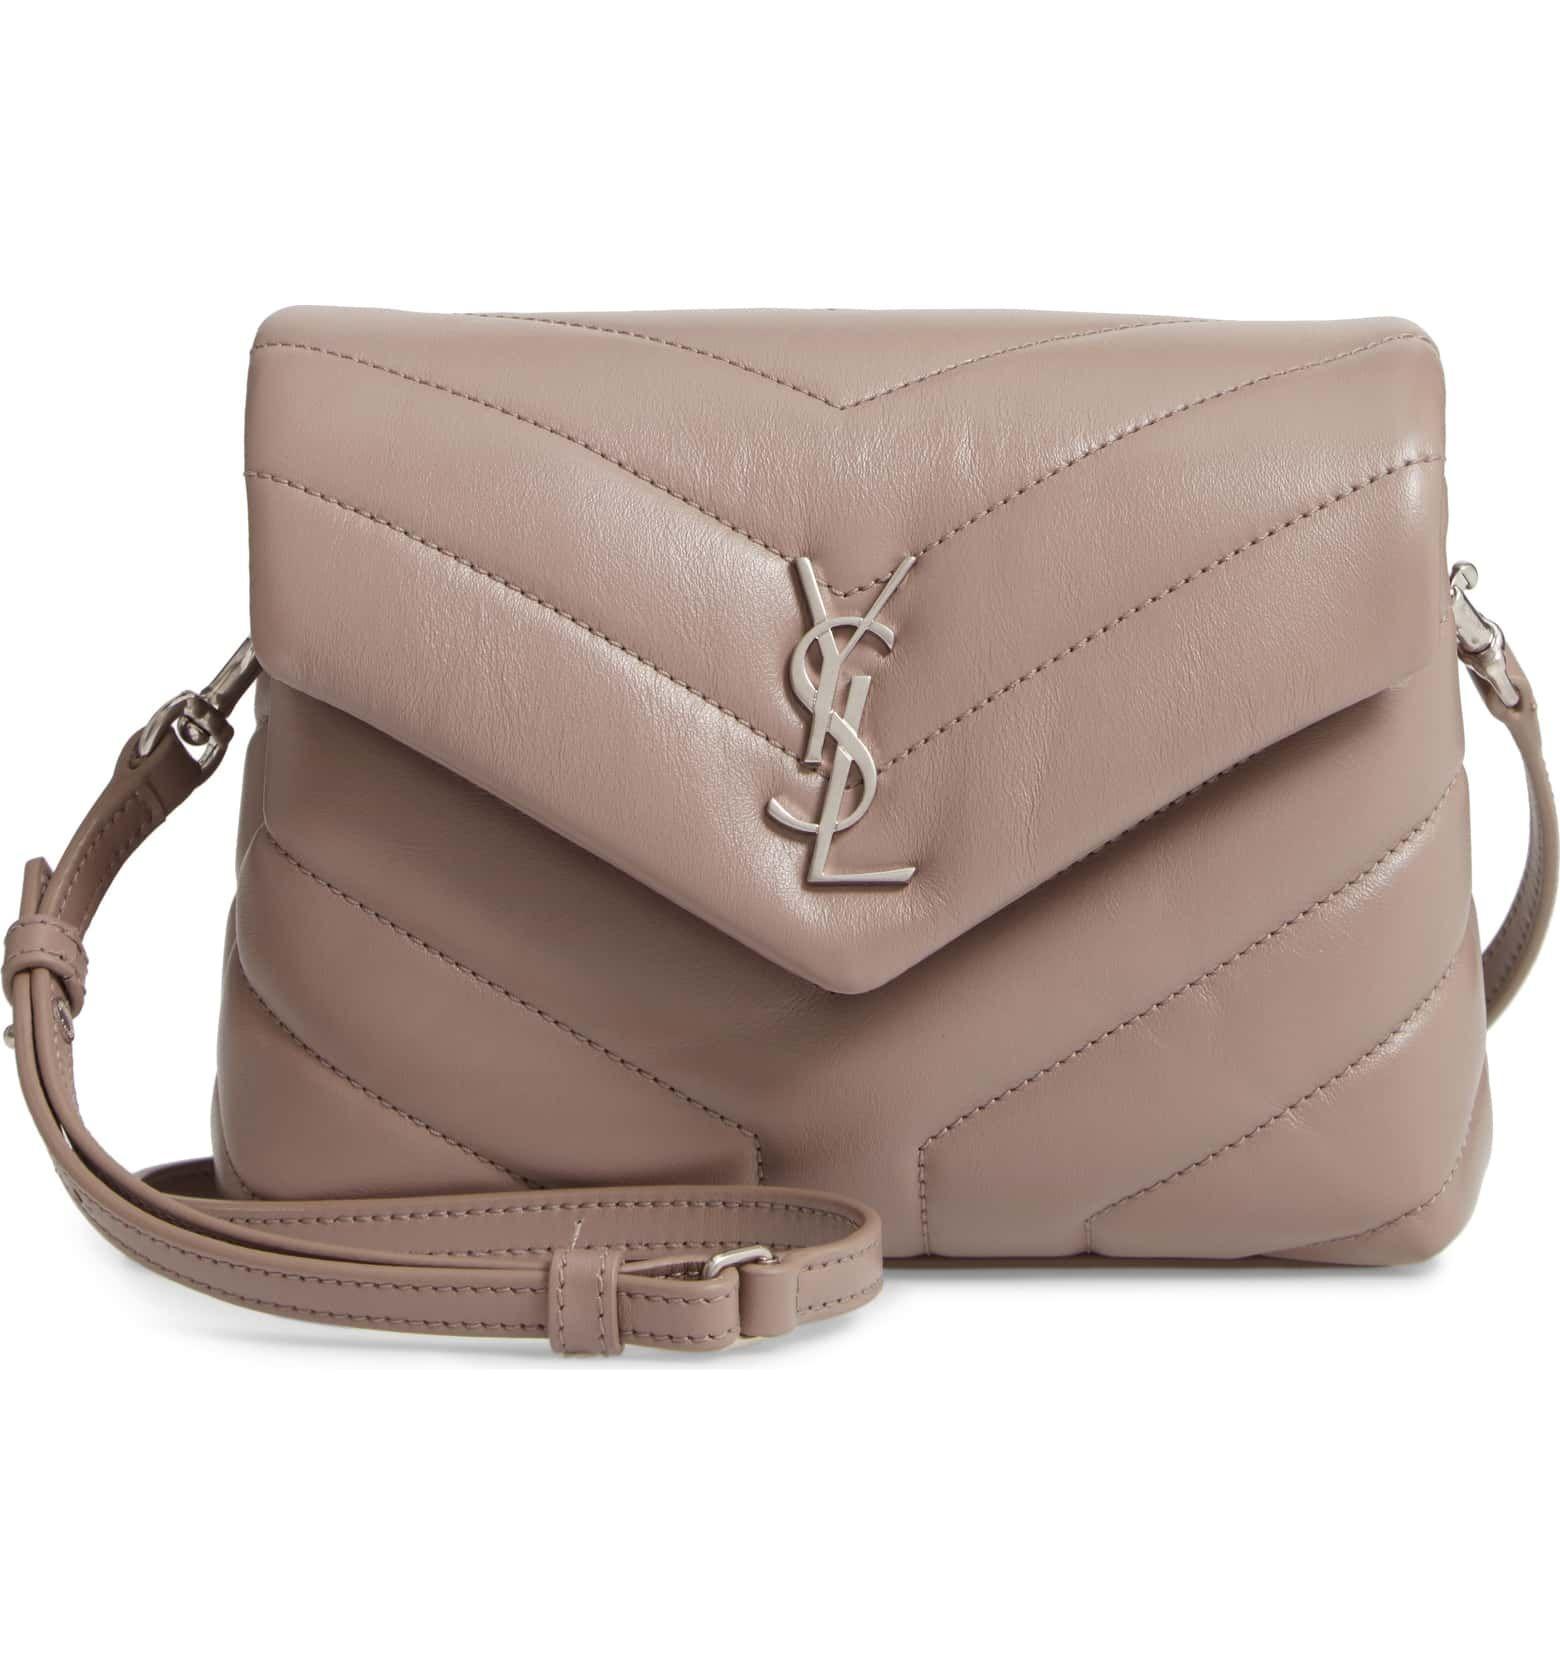 Italian Calf Skin Leather Handbag Cross Body Bag Structured Designer Bag